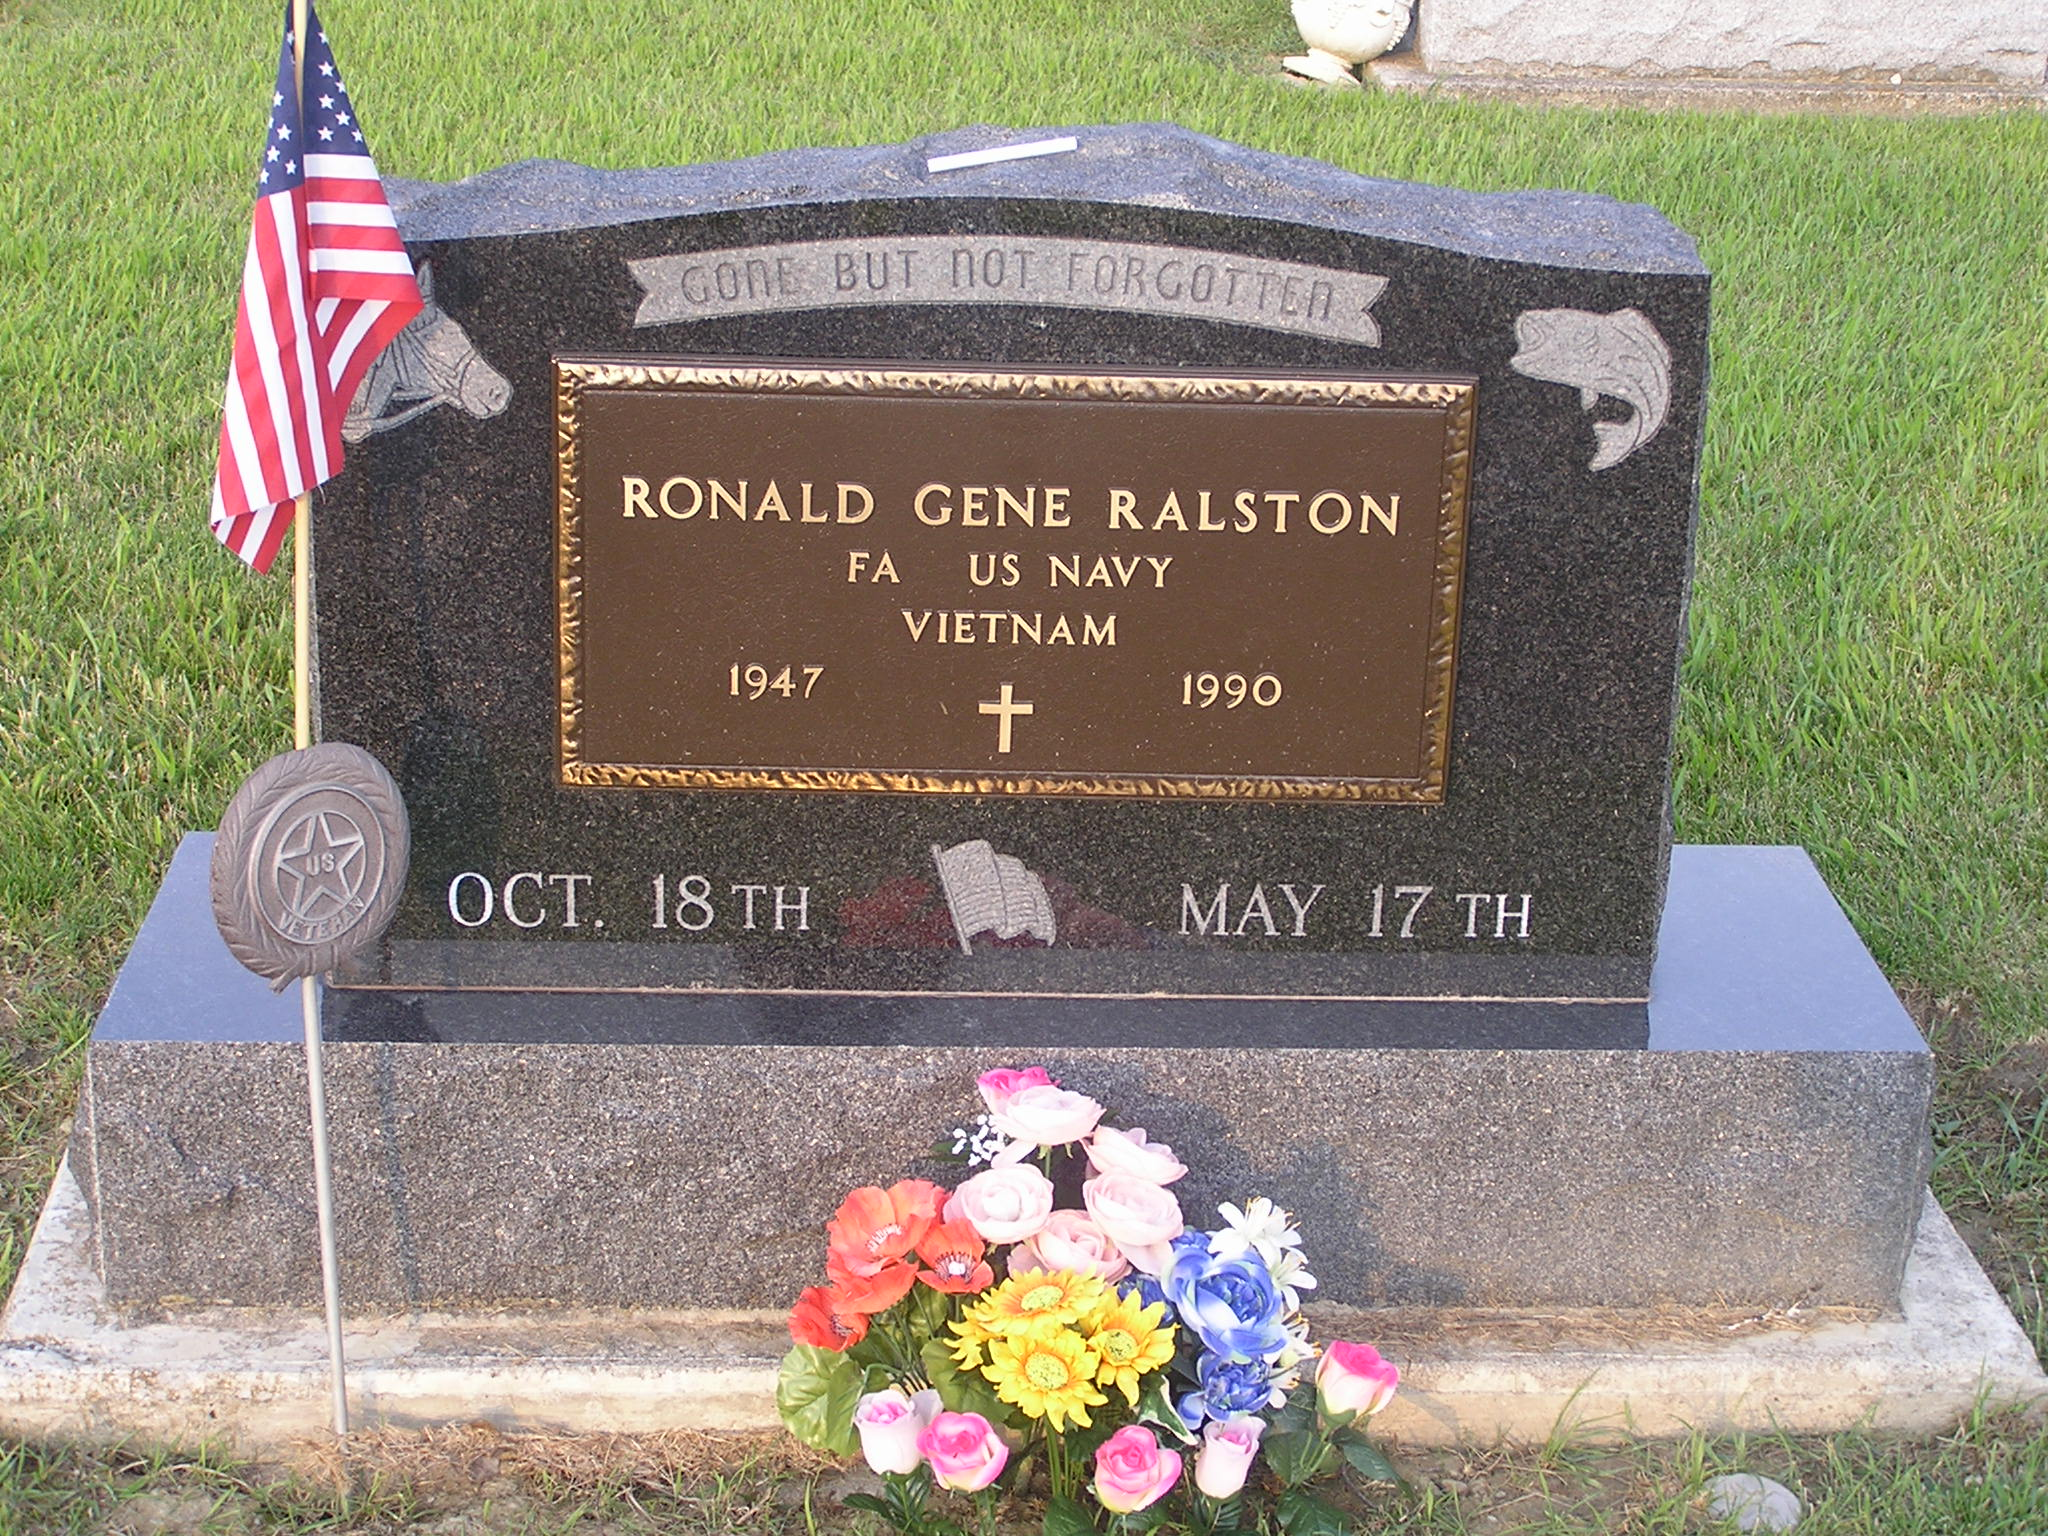 Donald Gene Ralston